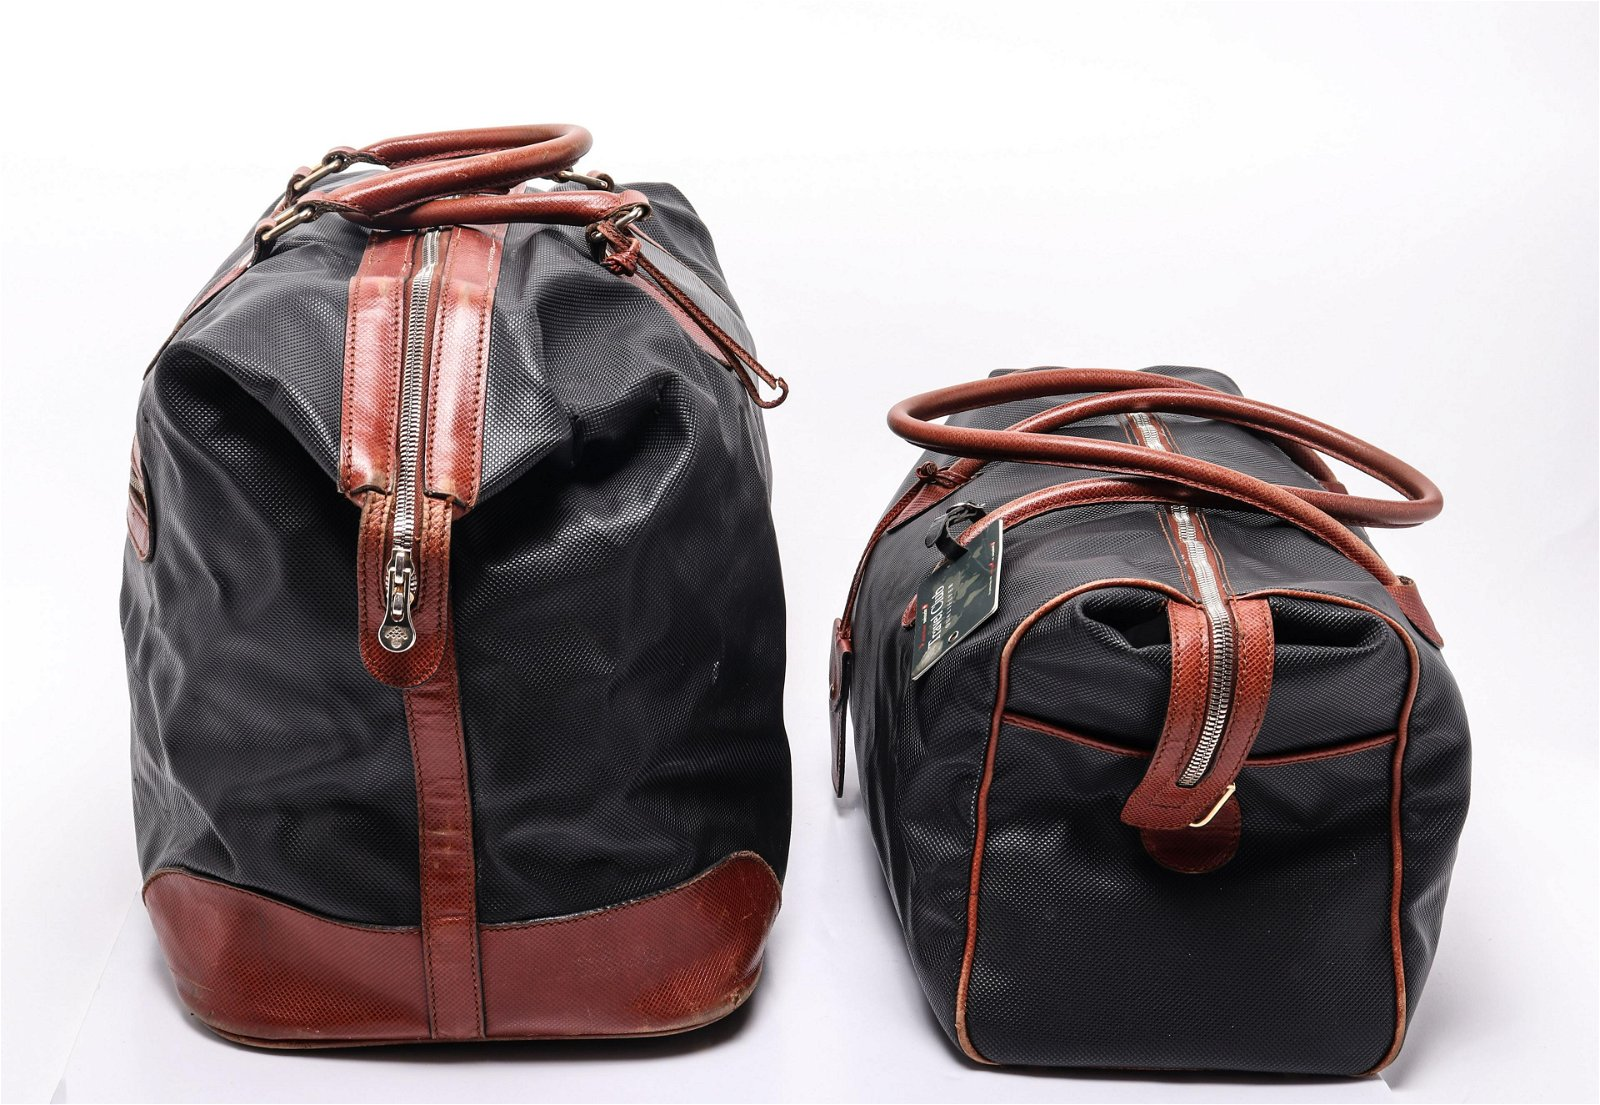 Bottega Veneta Leather Travel Bags / Totes, 2